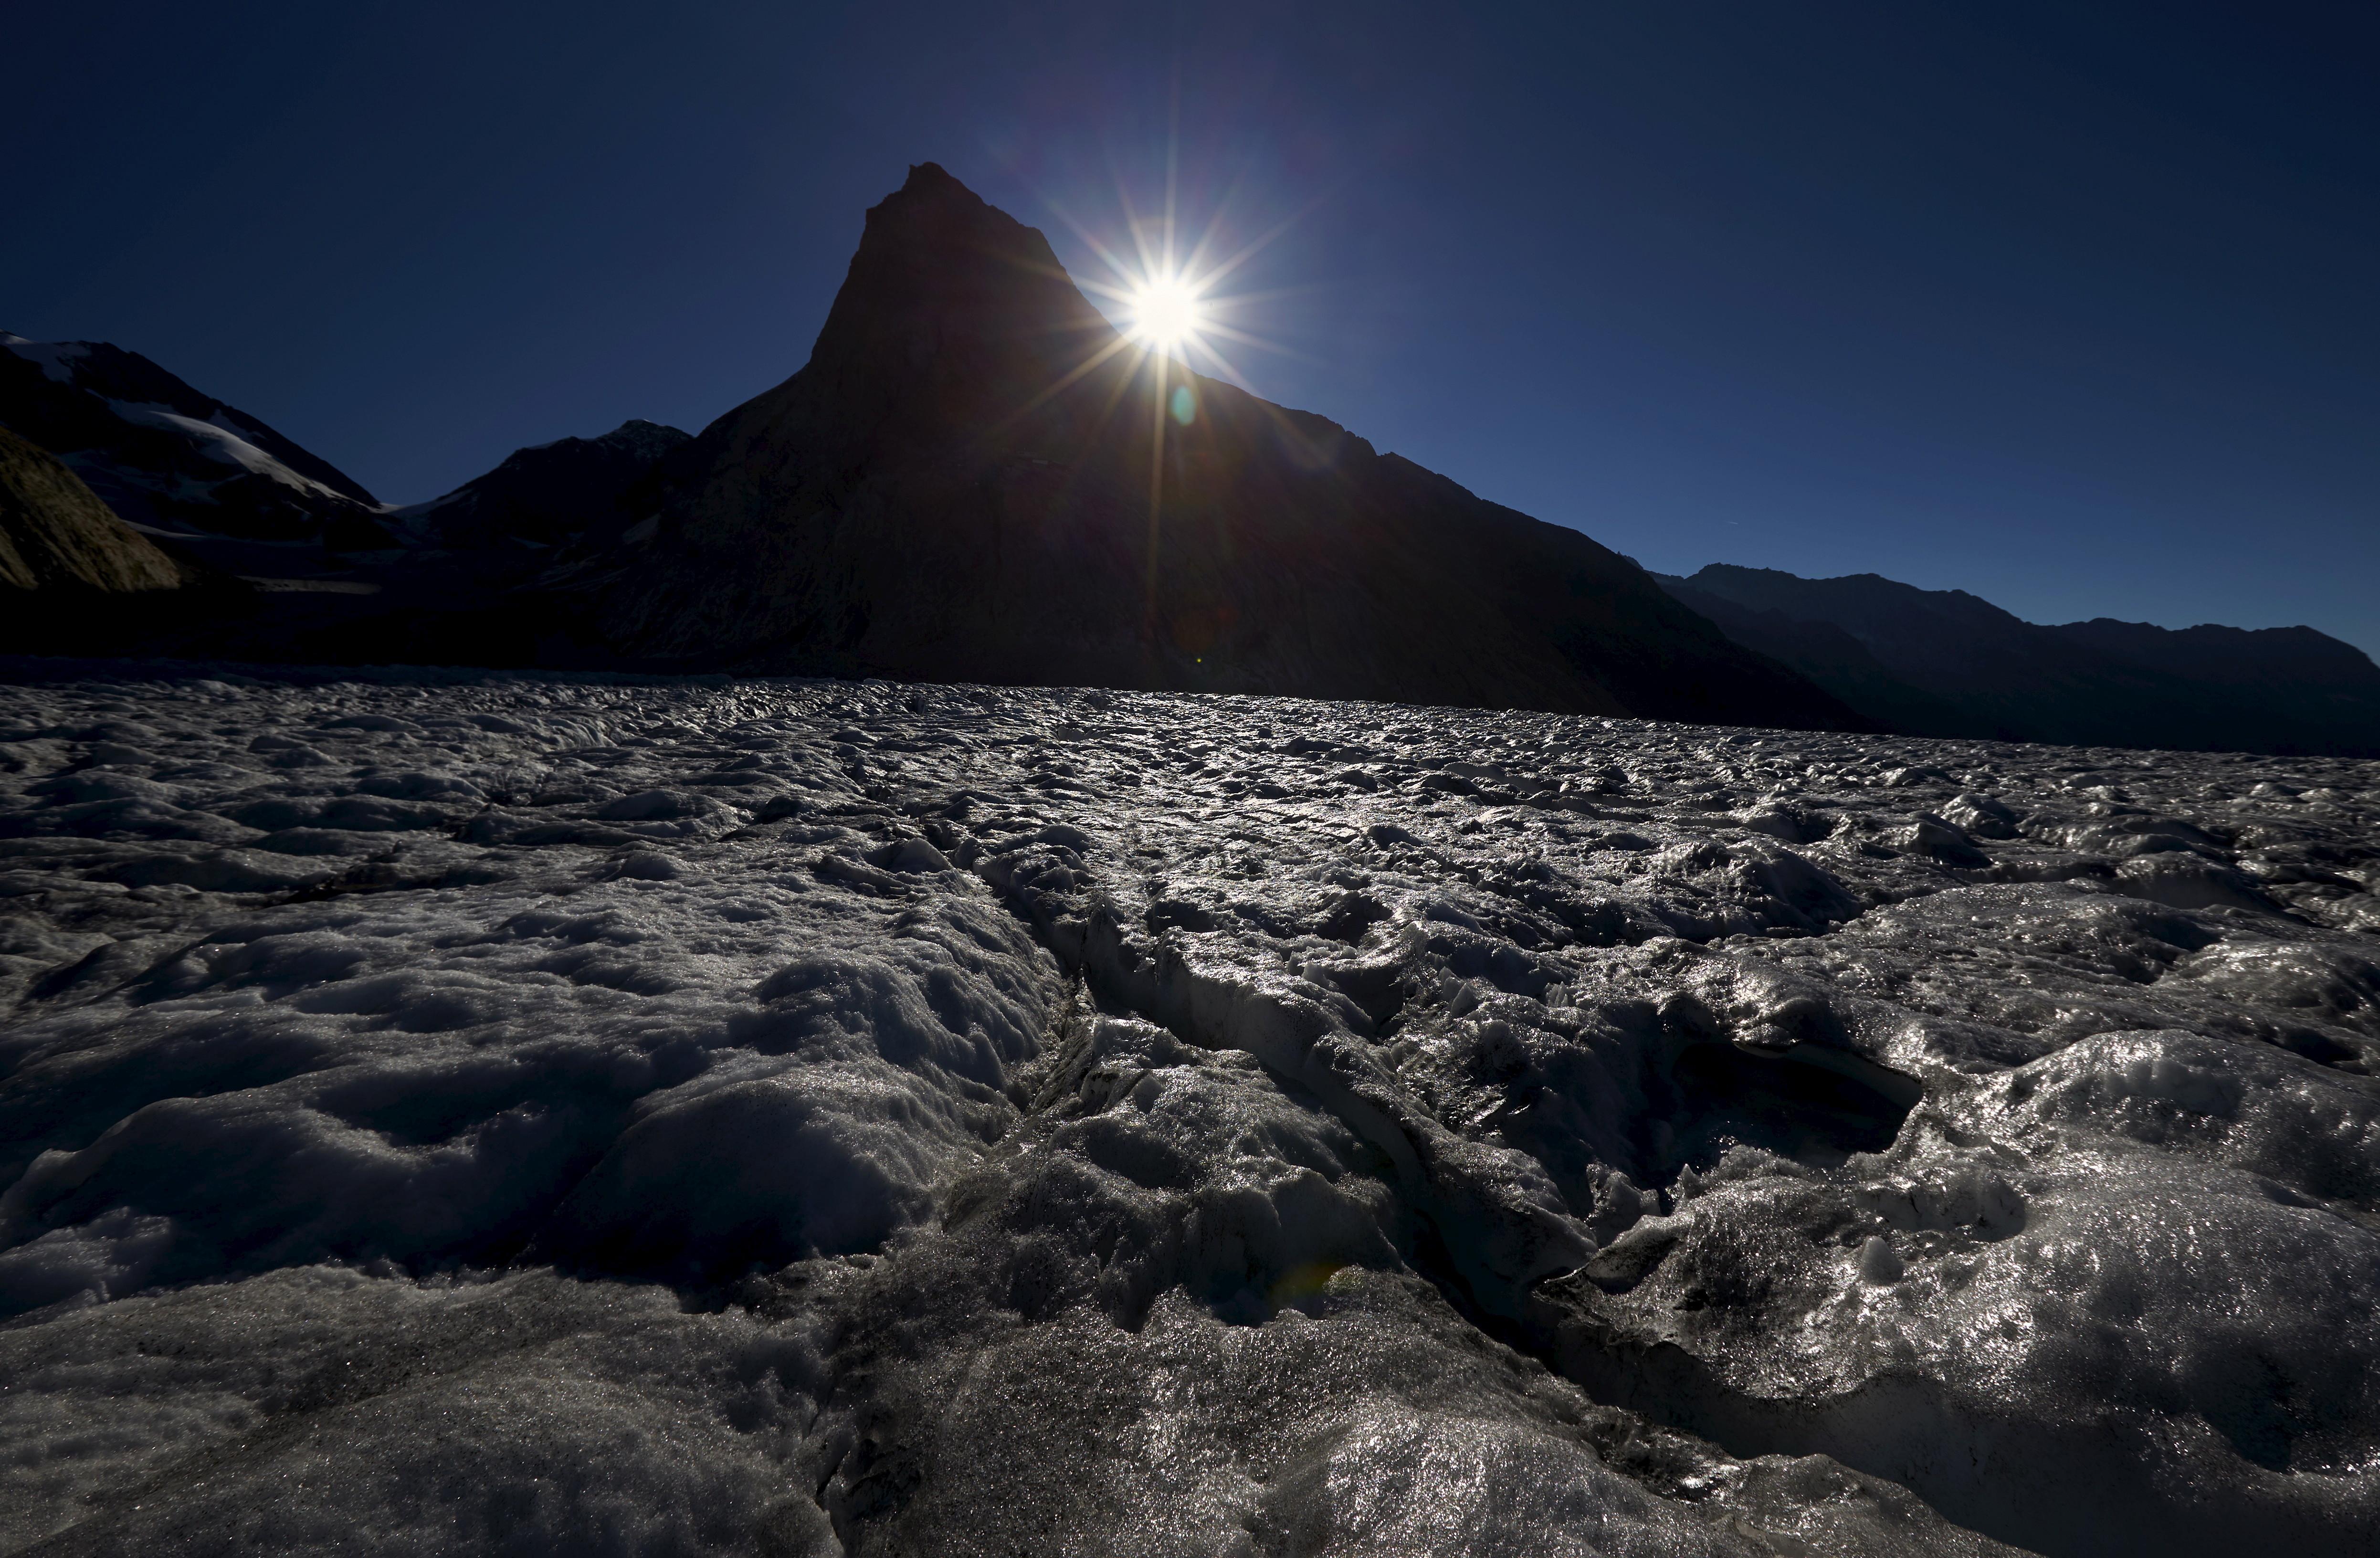 The sun rises behind the Konkordia Hut on the Aletsch Glacier, Switzerland, August 29.